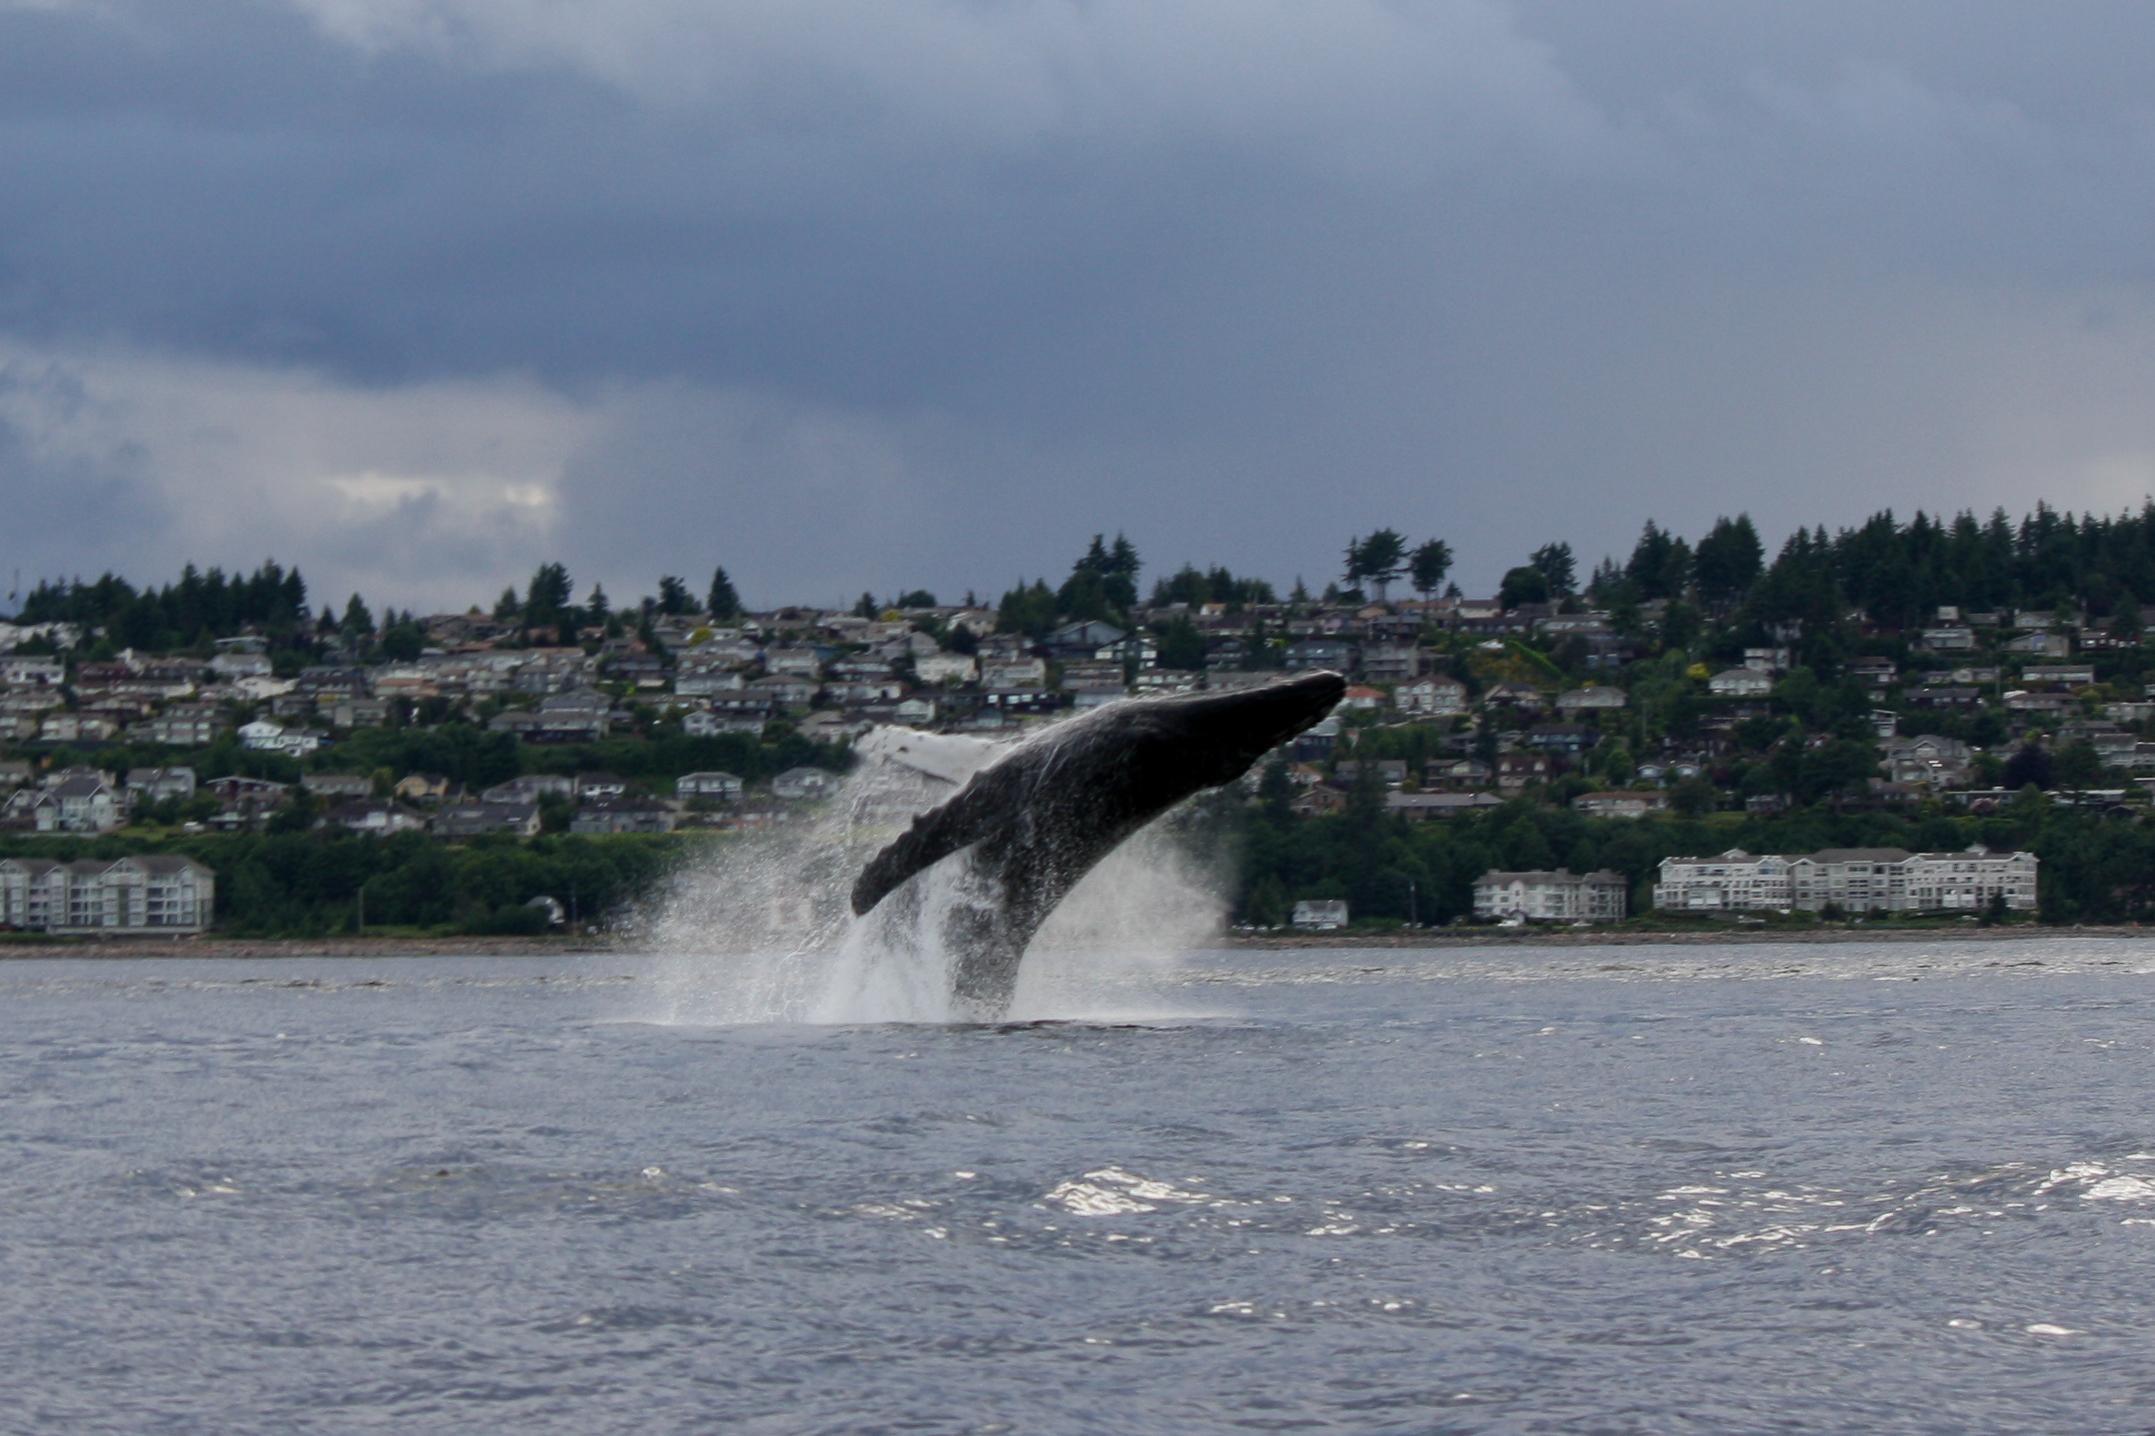 Oak And Orca Vancouver Island